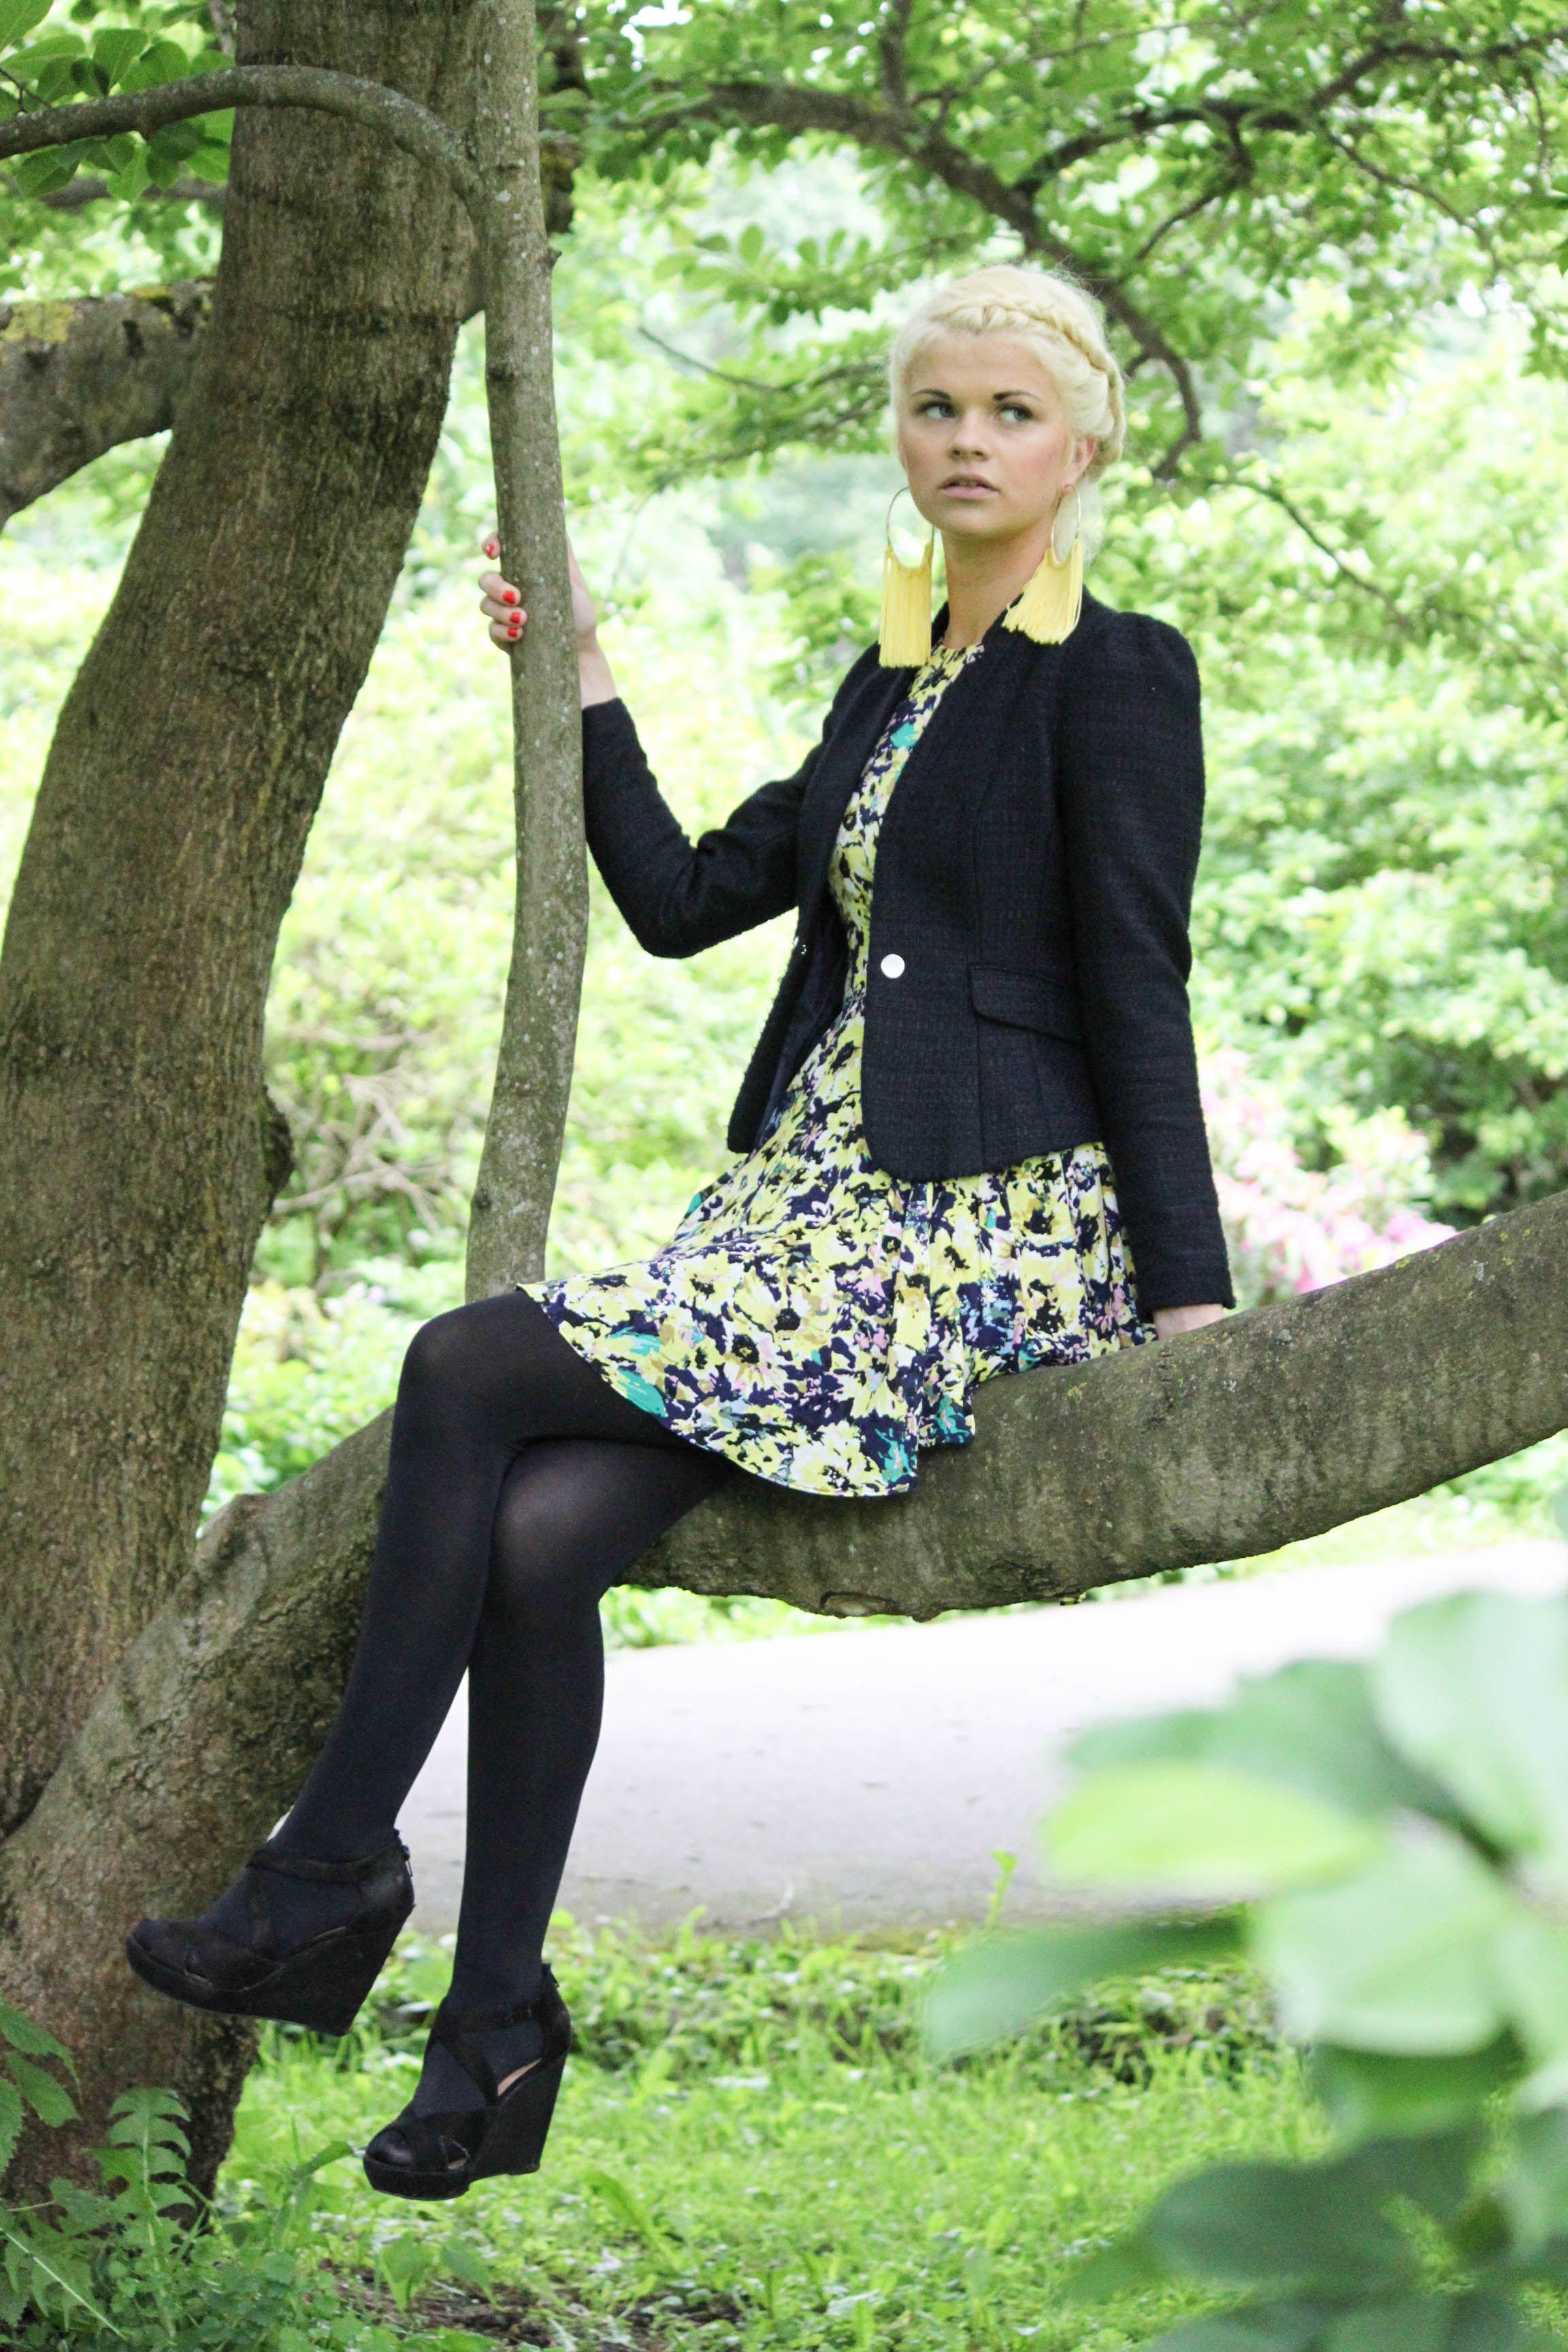 Foto:Laura Strautiņa Modele:Ilva Krūmiņa